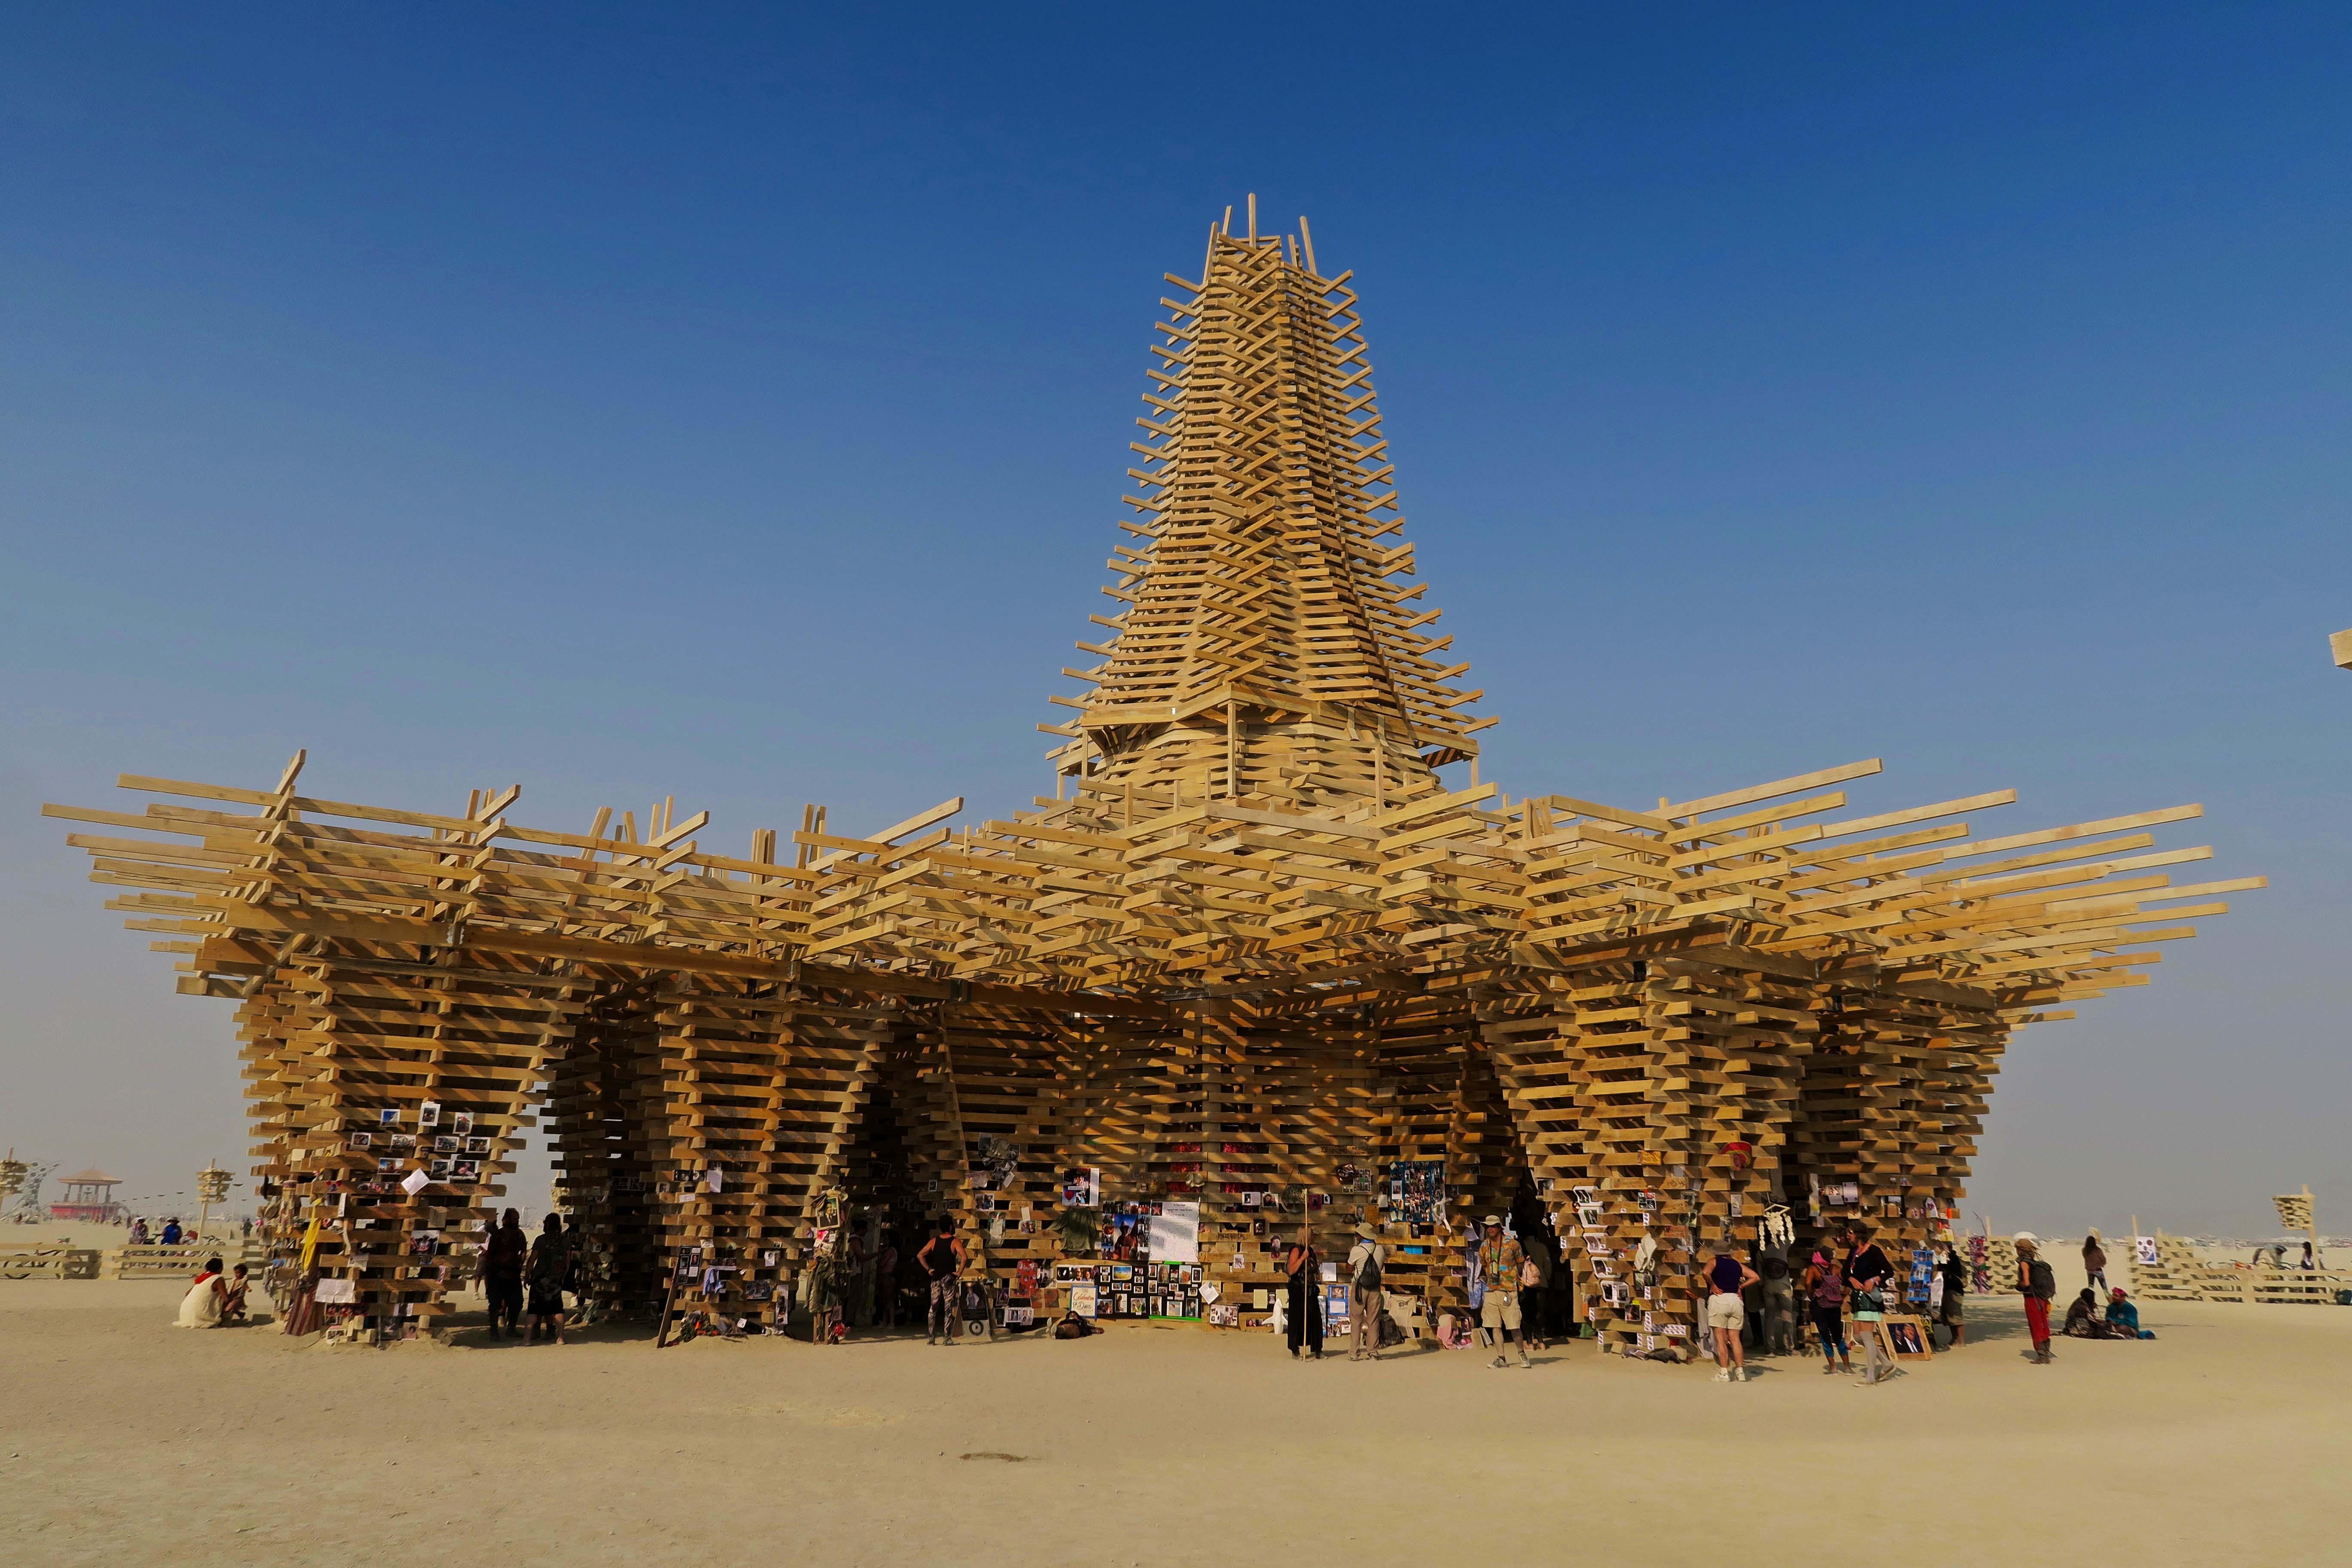 Temple view at Burning Man 2017